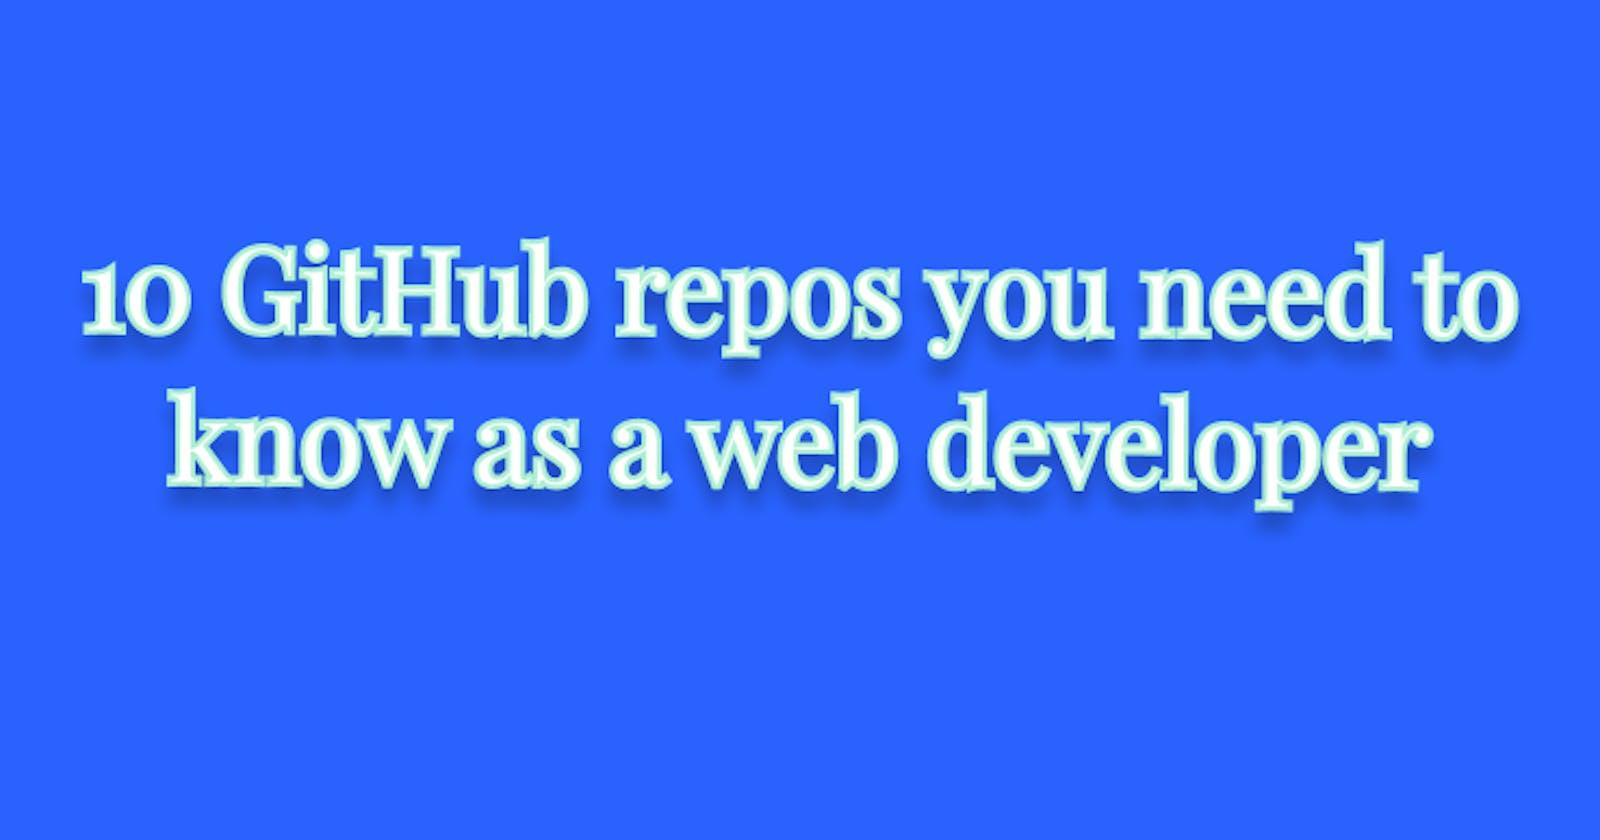 10 GitHub repos you need to know as a web developer